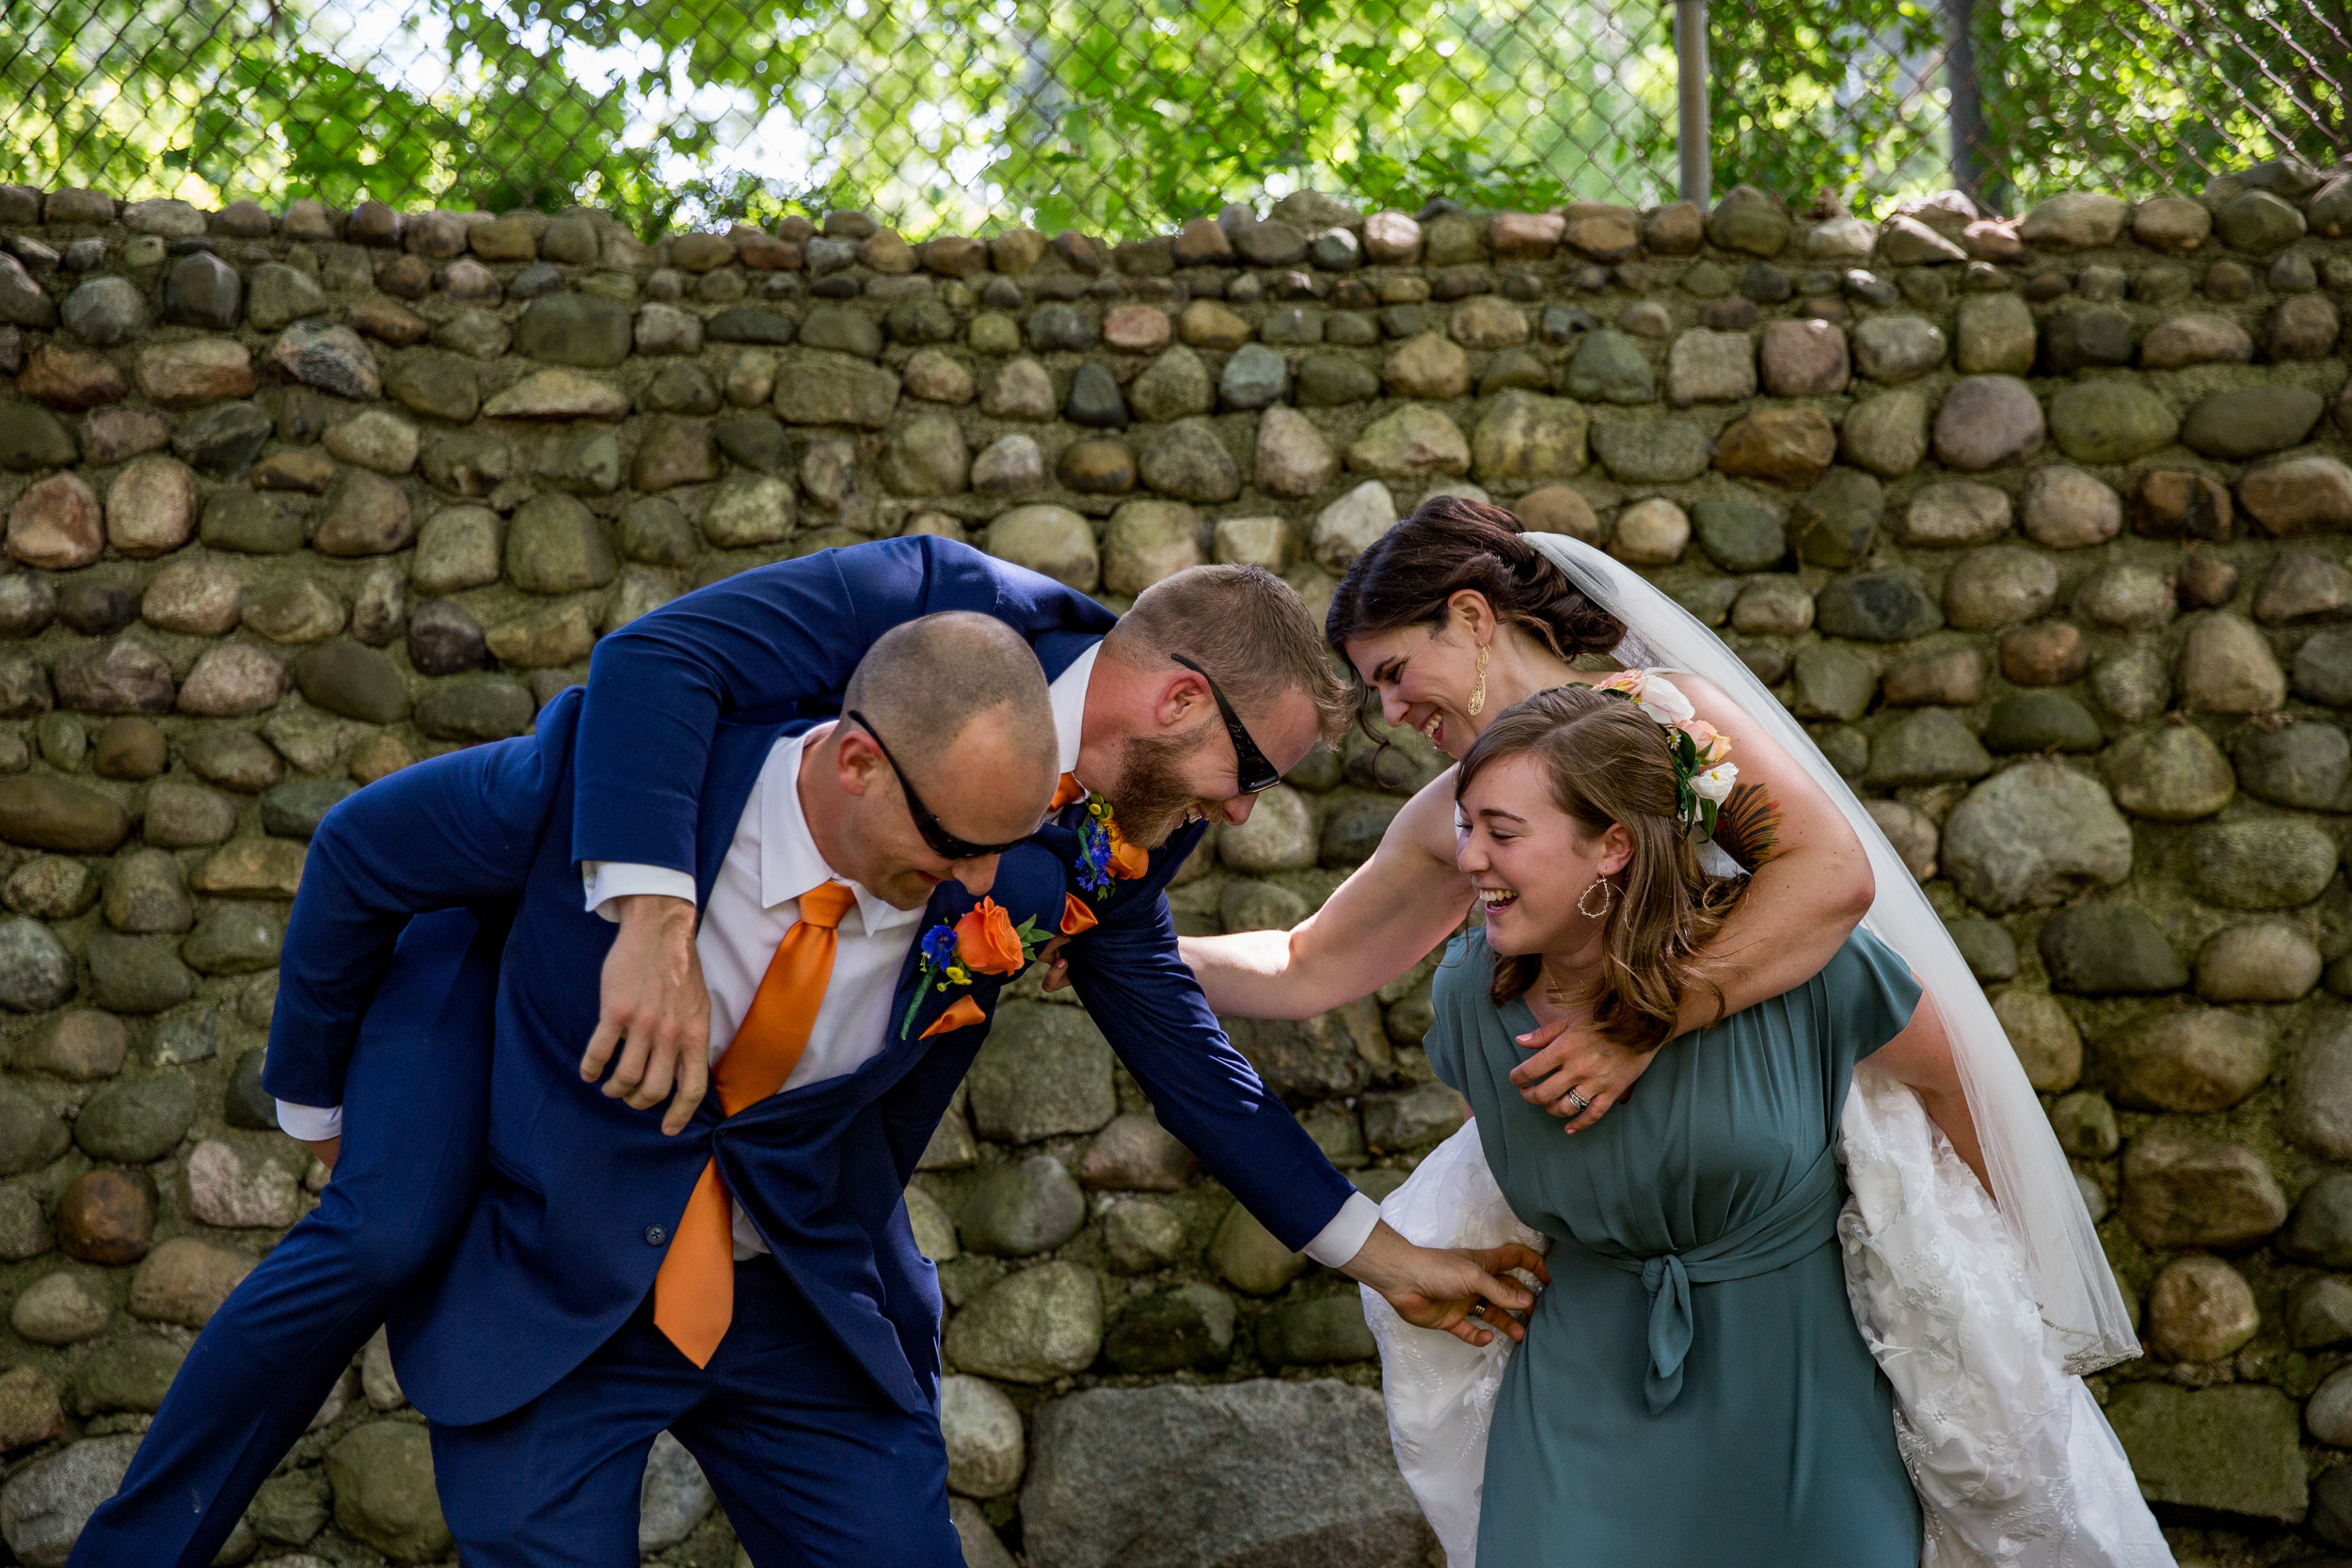 Natalie and Dallas Mooney Wedding 6-8-19_Tania Watt Photography-372.jpg